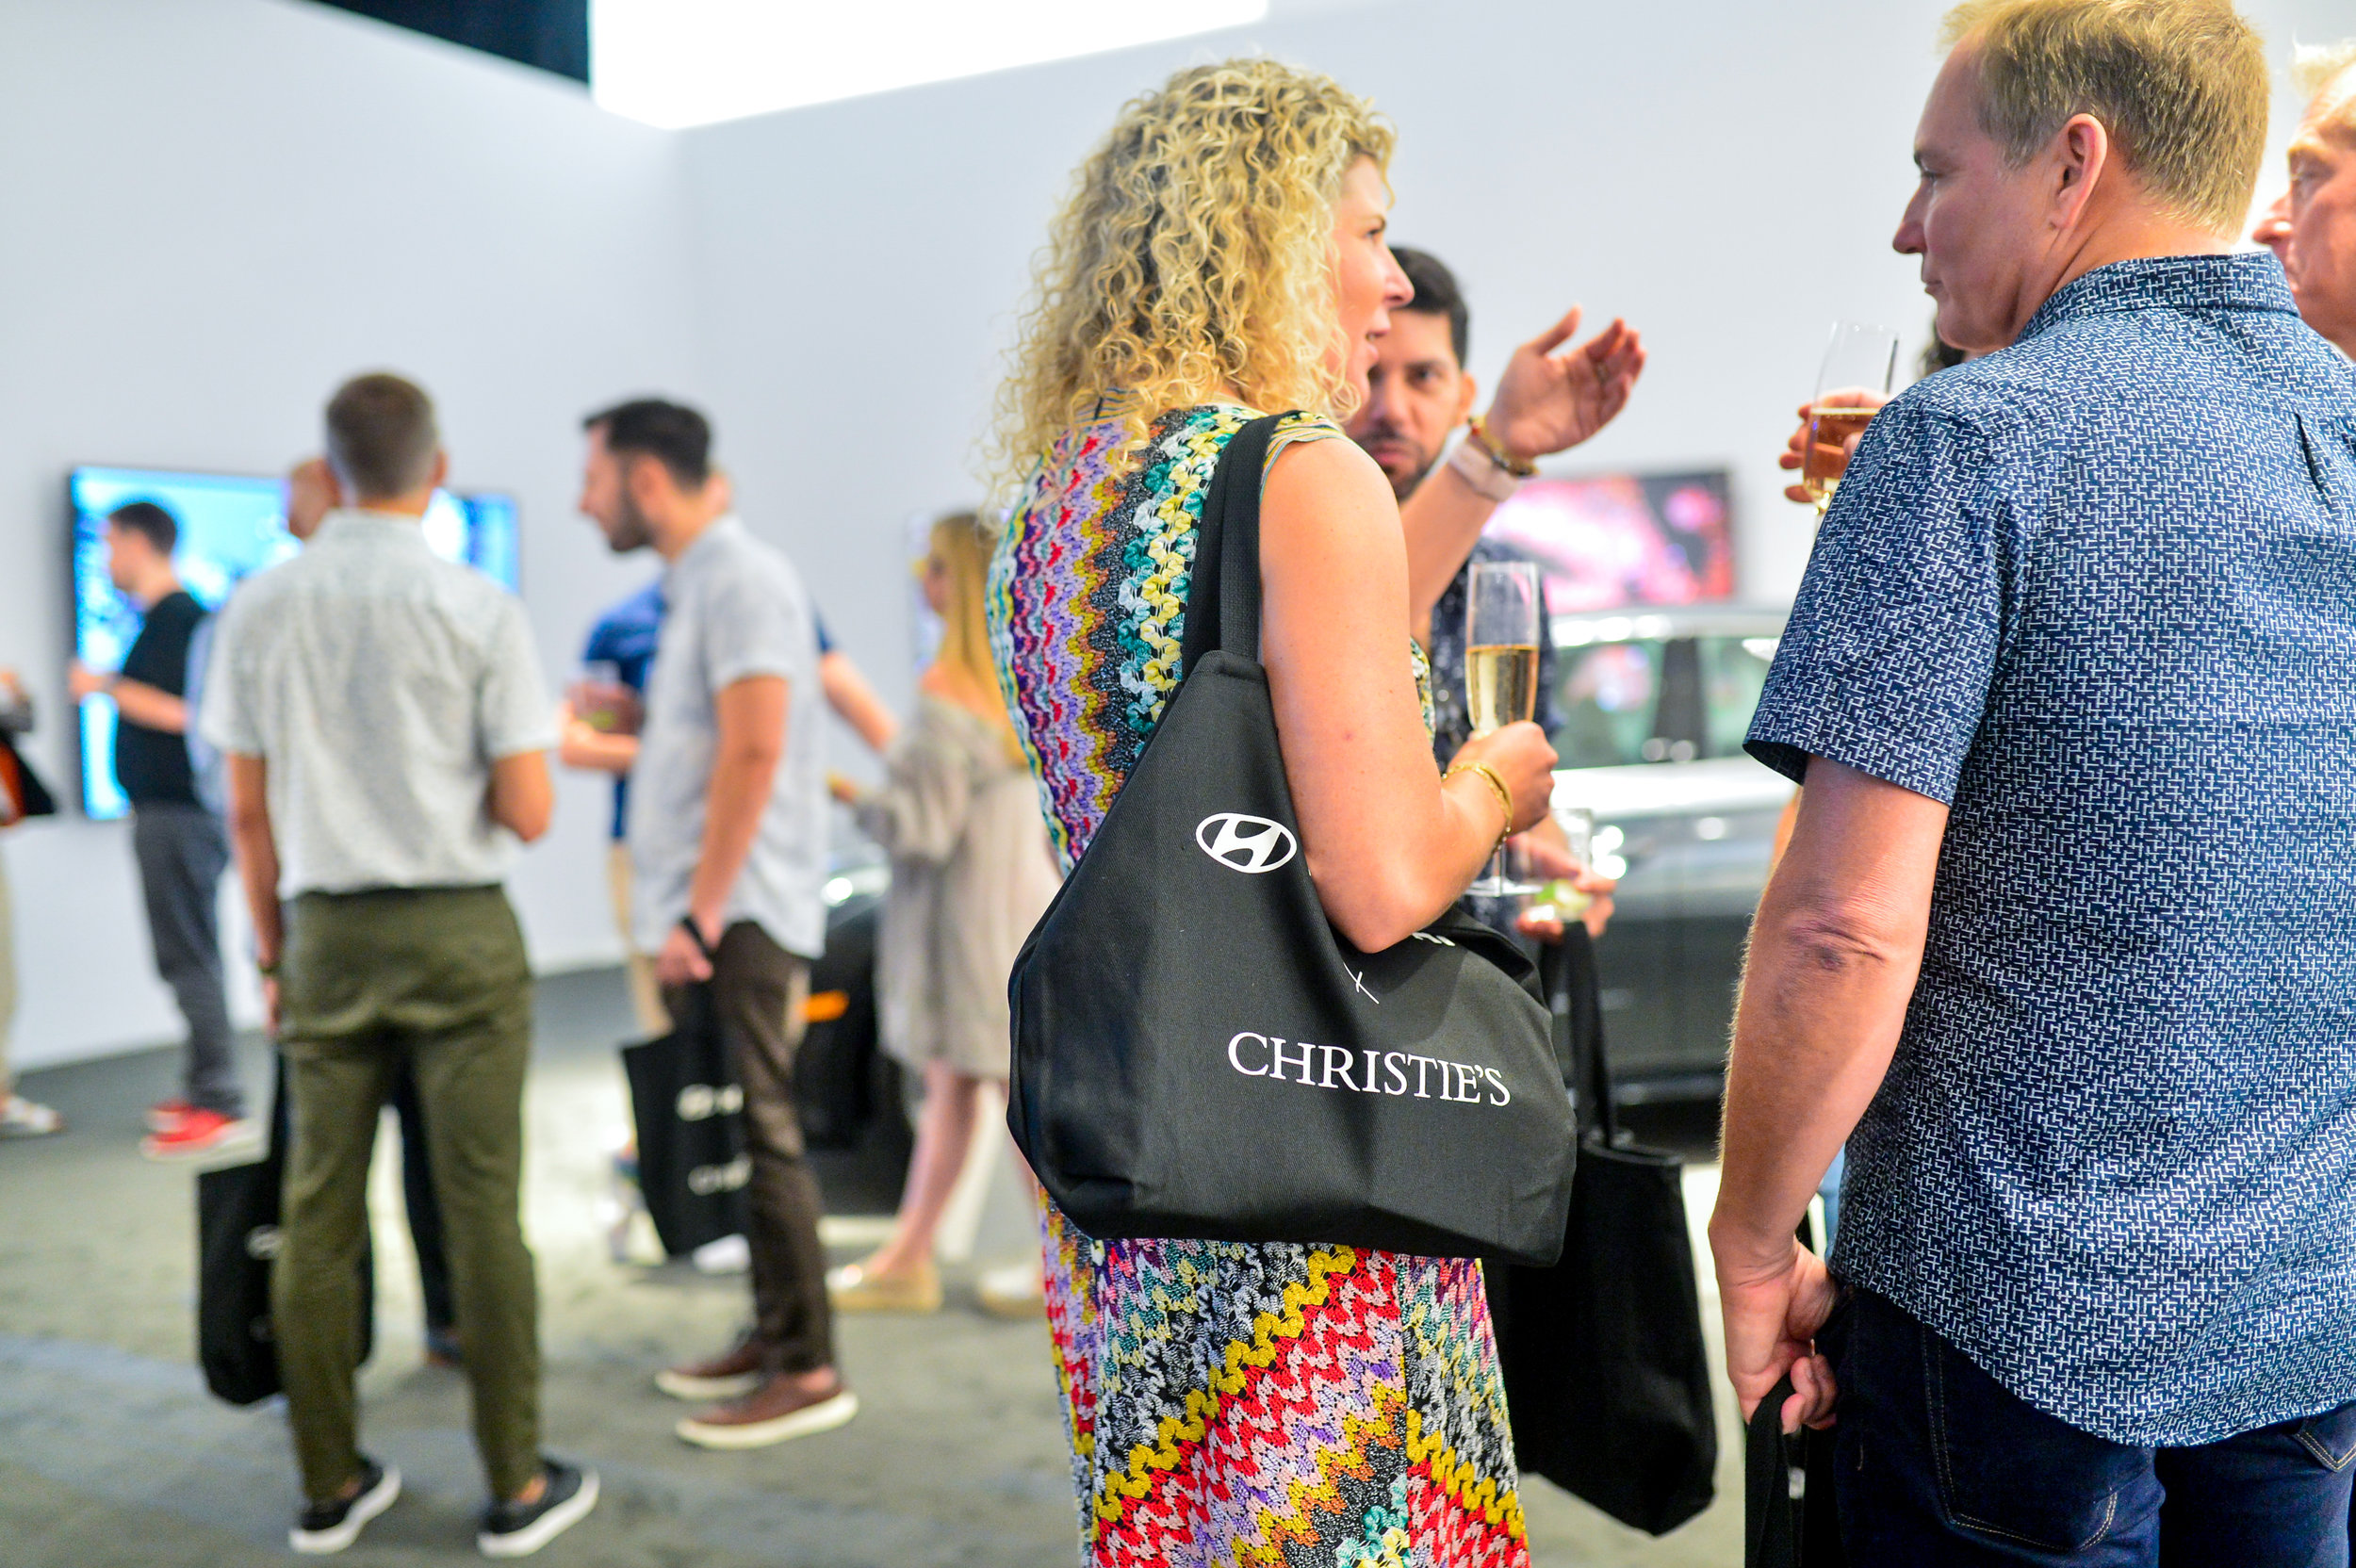 OHelloMedia-Hyundai-Christie'sAuctionHouse-6.28-TopSelect-7039.jpg